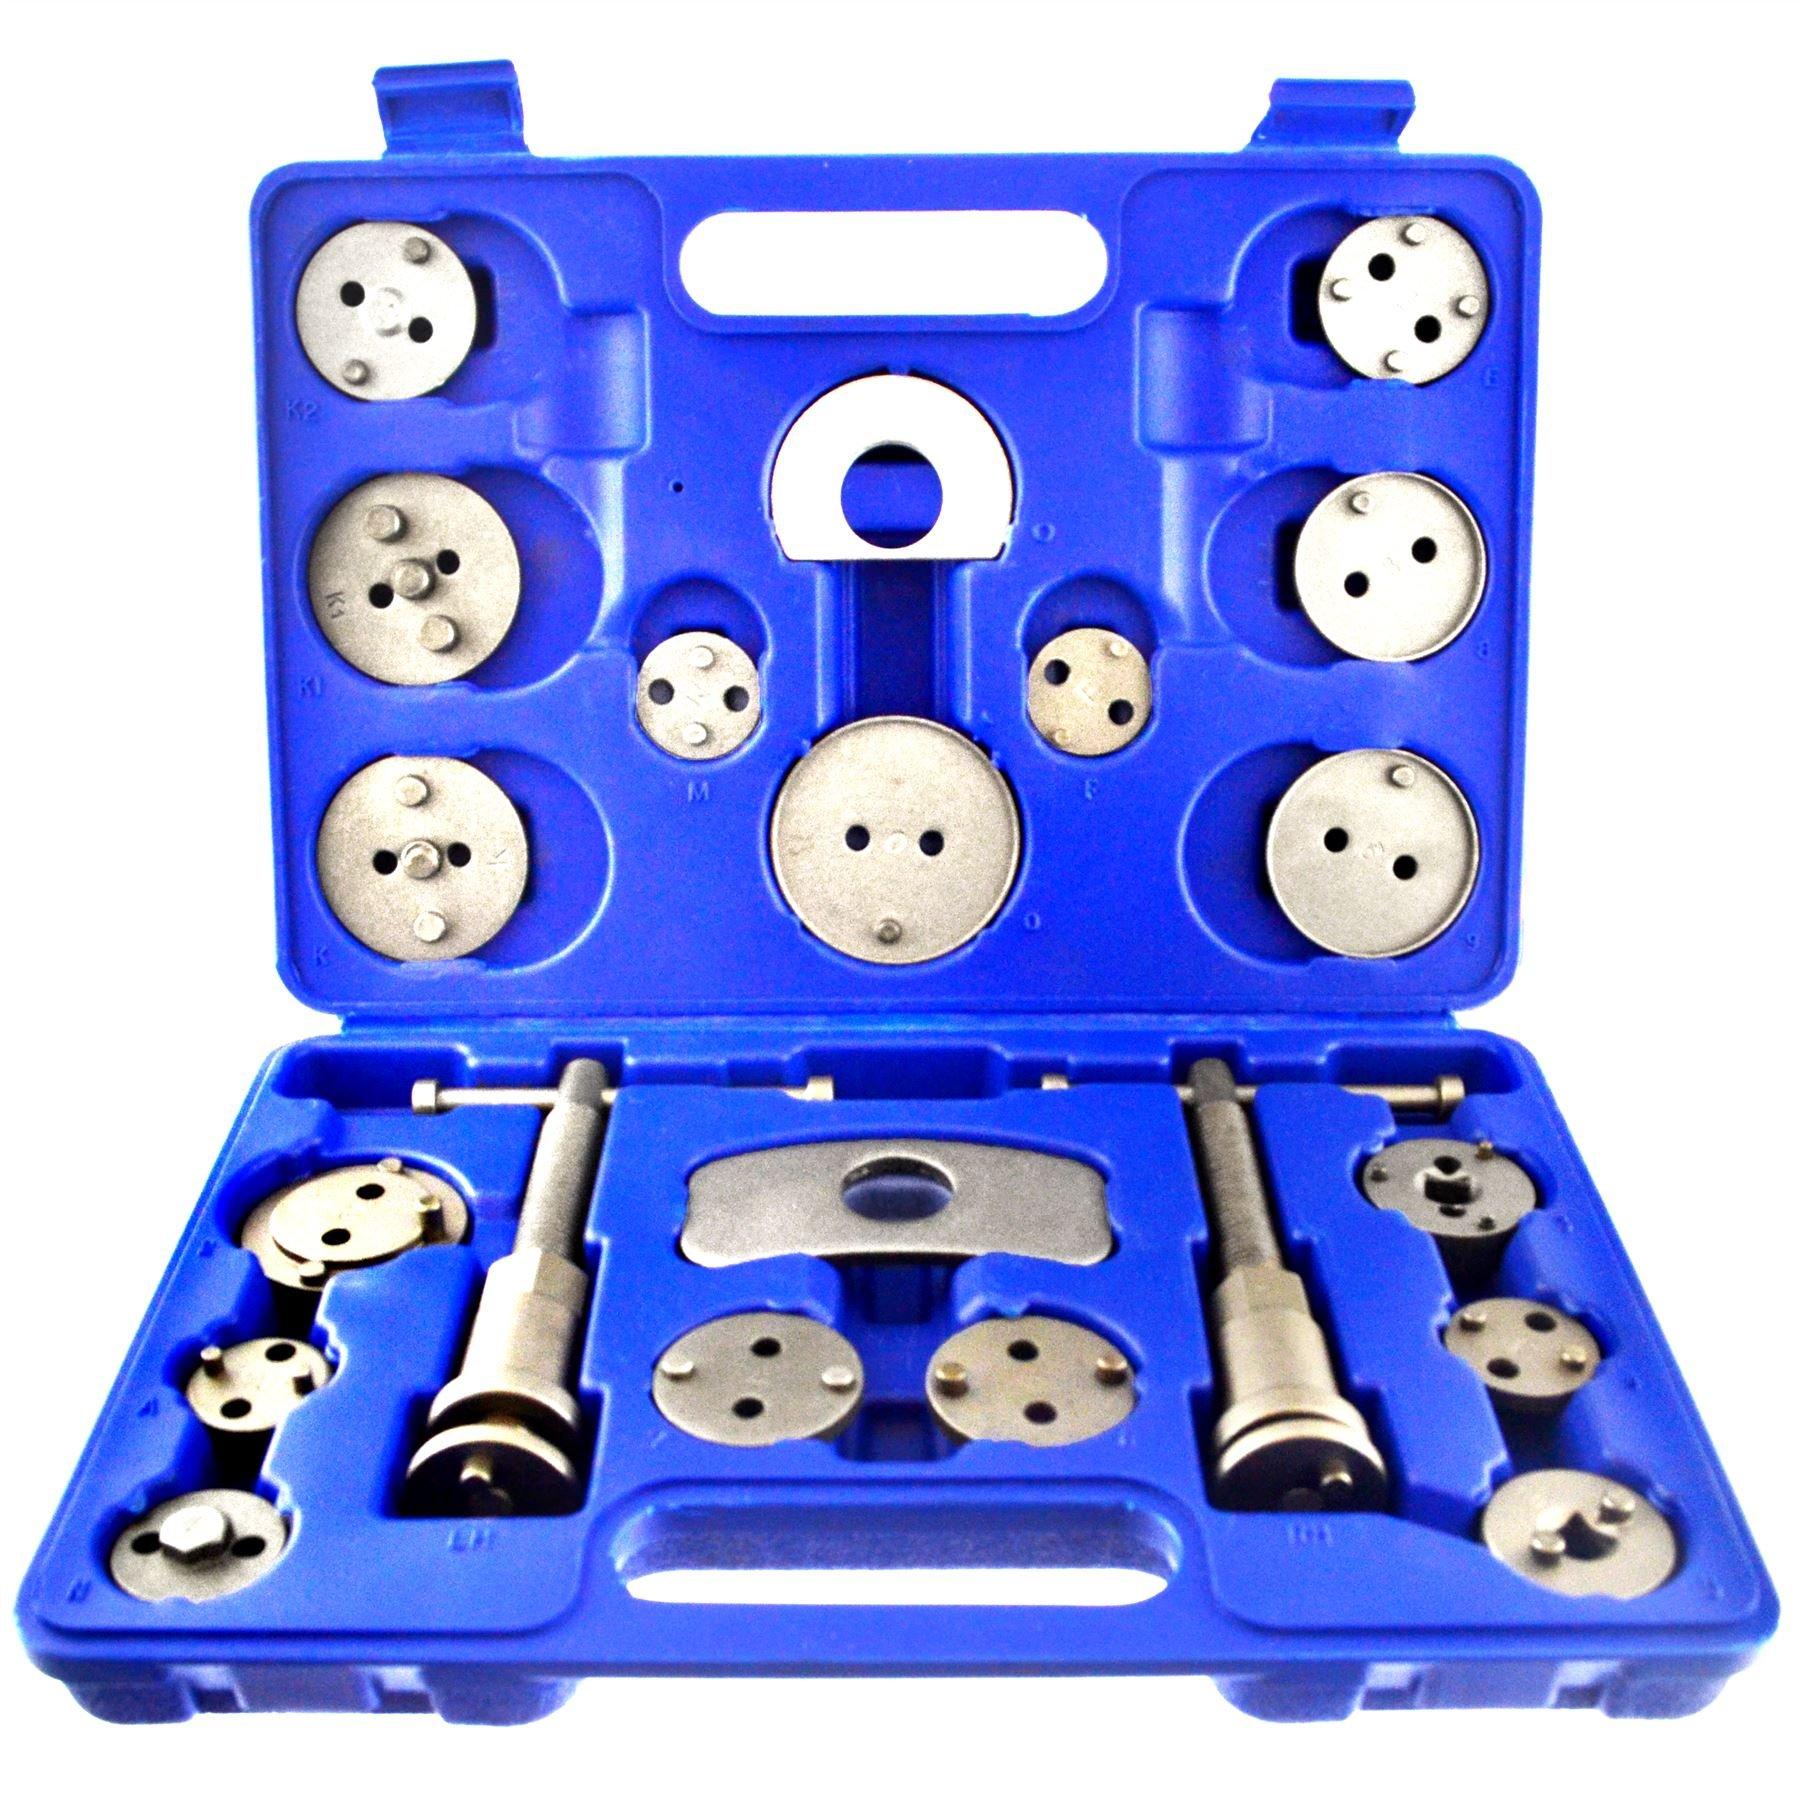 AB Tools-US Pro 21pc Left and Right Hand Brake Calliper Piston Wind Back Tool Kit AU019 by AB Tools-US Pro (Image #1)